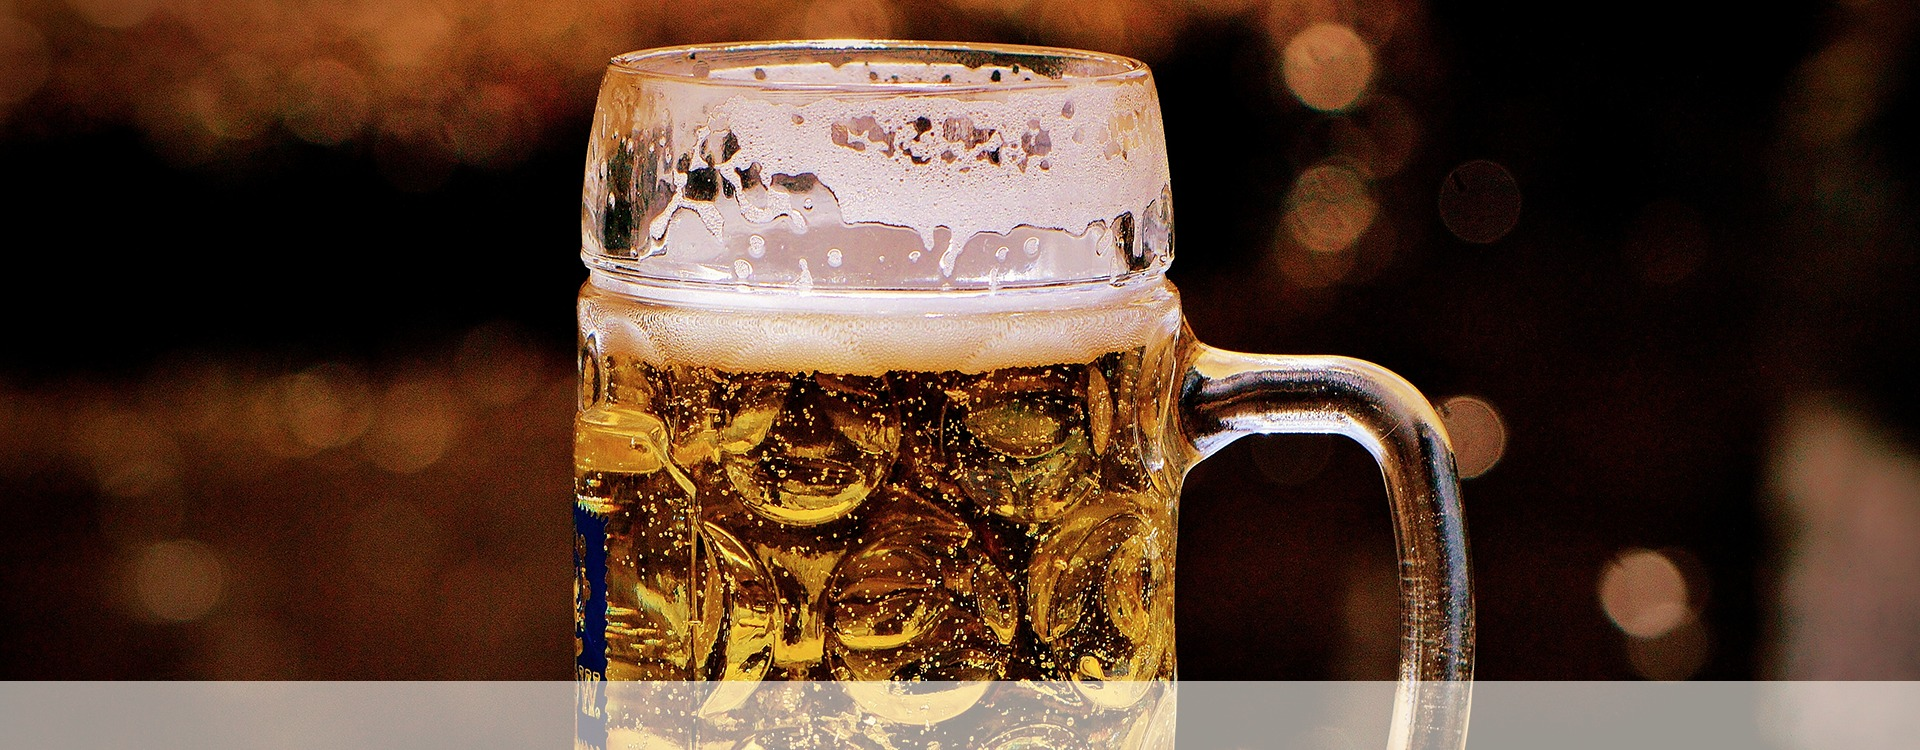 Hotel zum Oktoberfest nahe München, Maß Bier